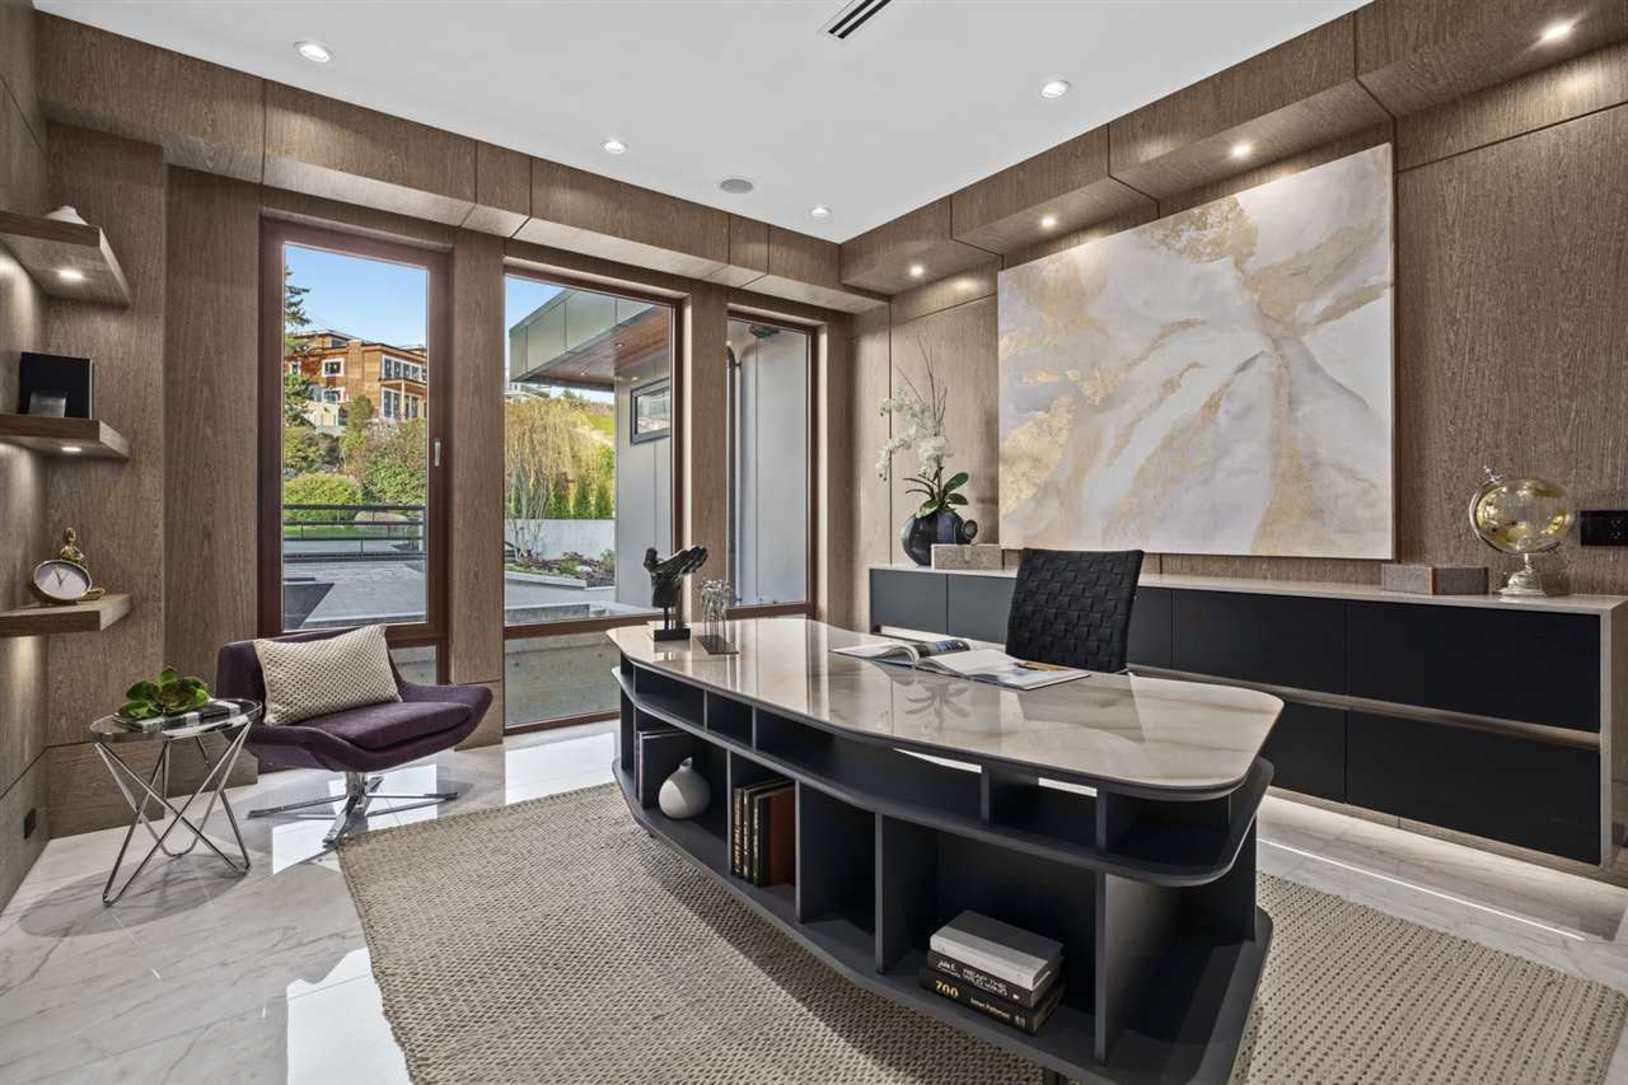 830-king-georges-way-british-properties-west-vancouver-07 at 830 King Georges Way, British Properties, West Vancouver